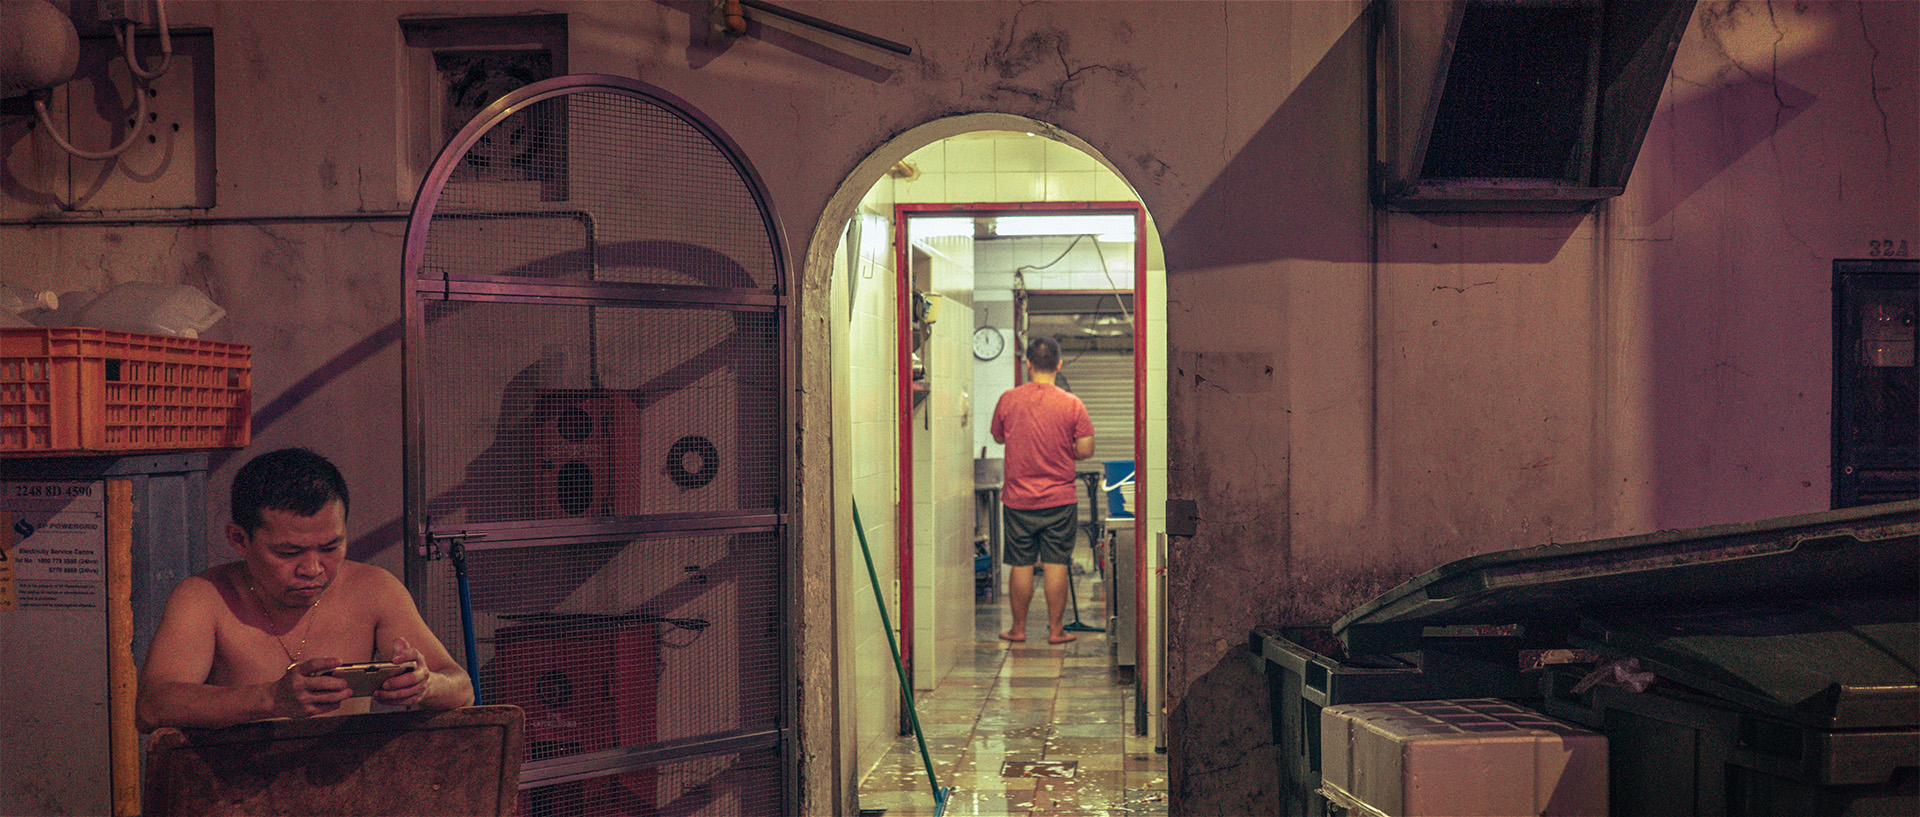 Nikko Pascua Travel photography Singapore_09199.jpg